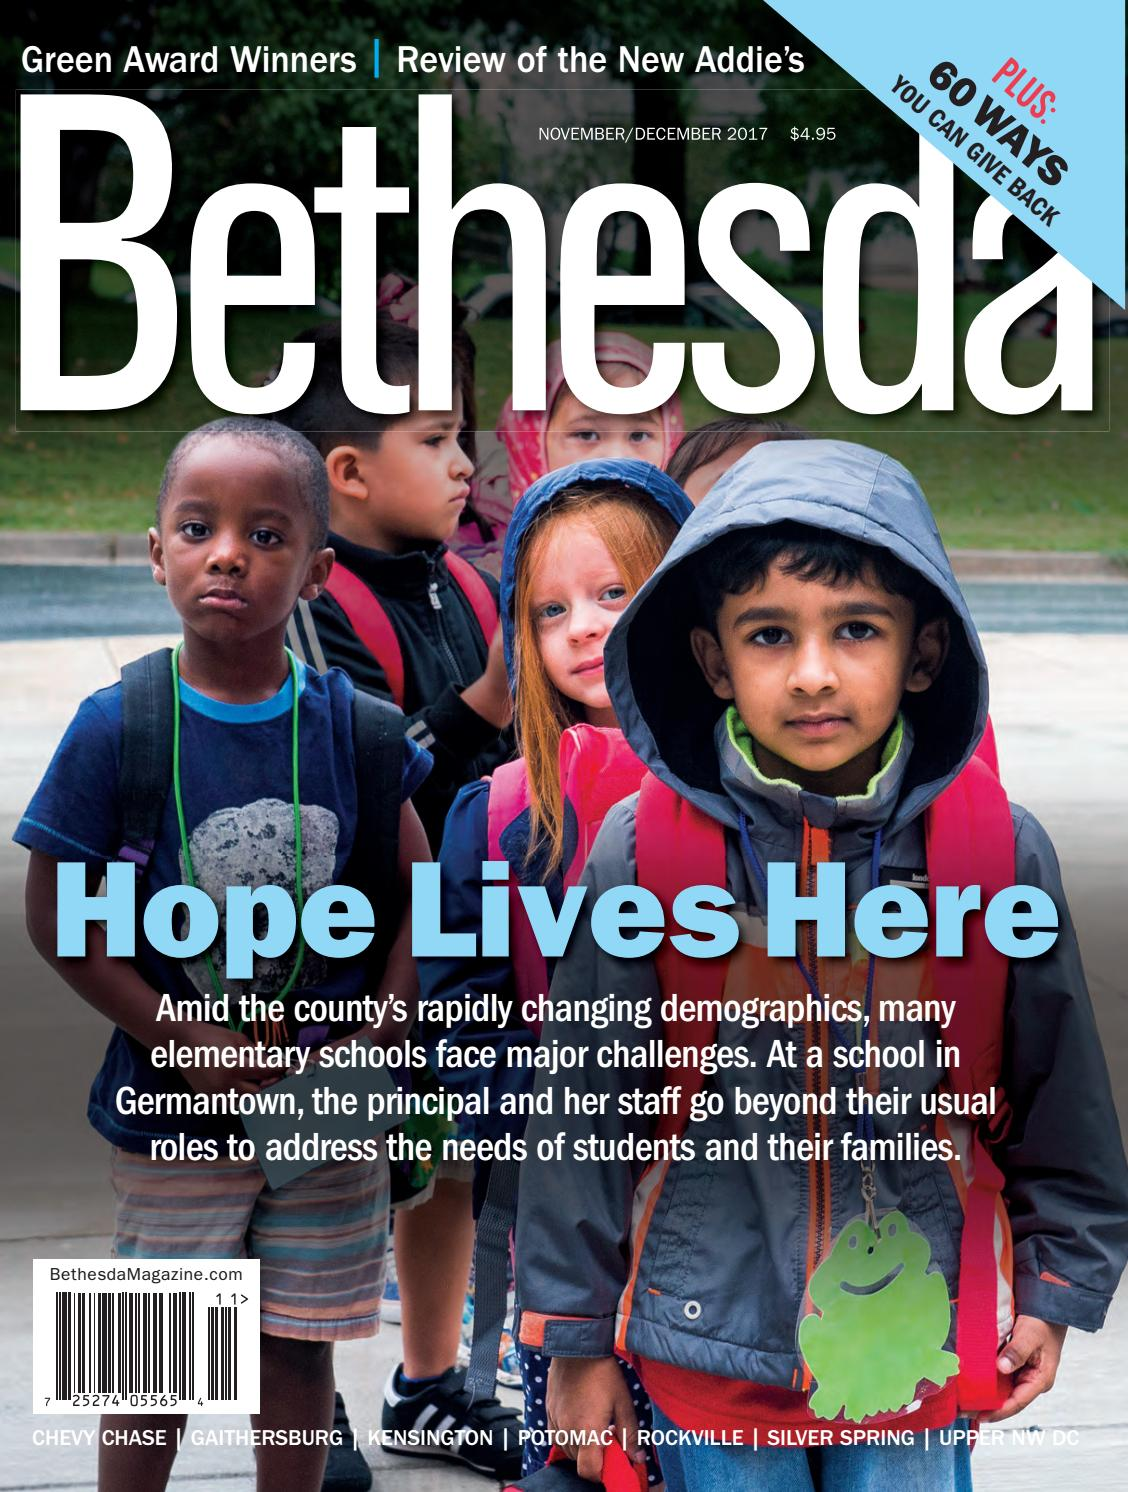 Bethesda Magazine: November-December 2017 by Bethesda Magazine - issuu